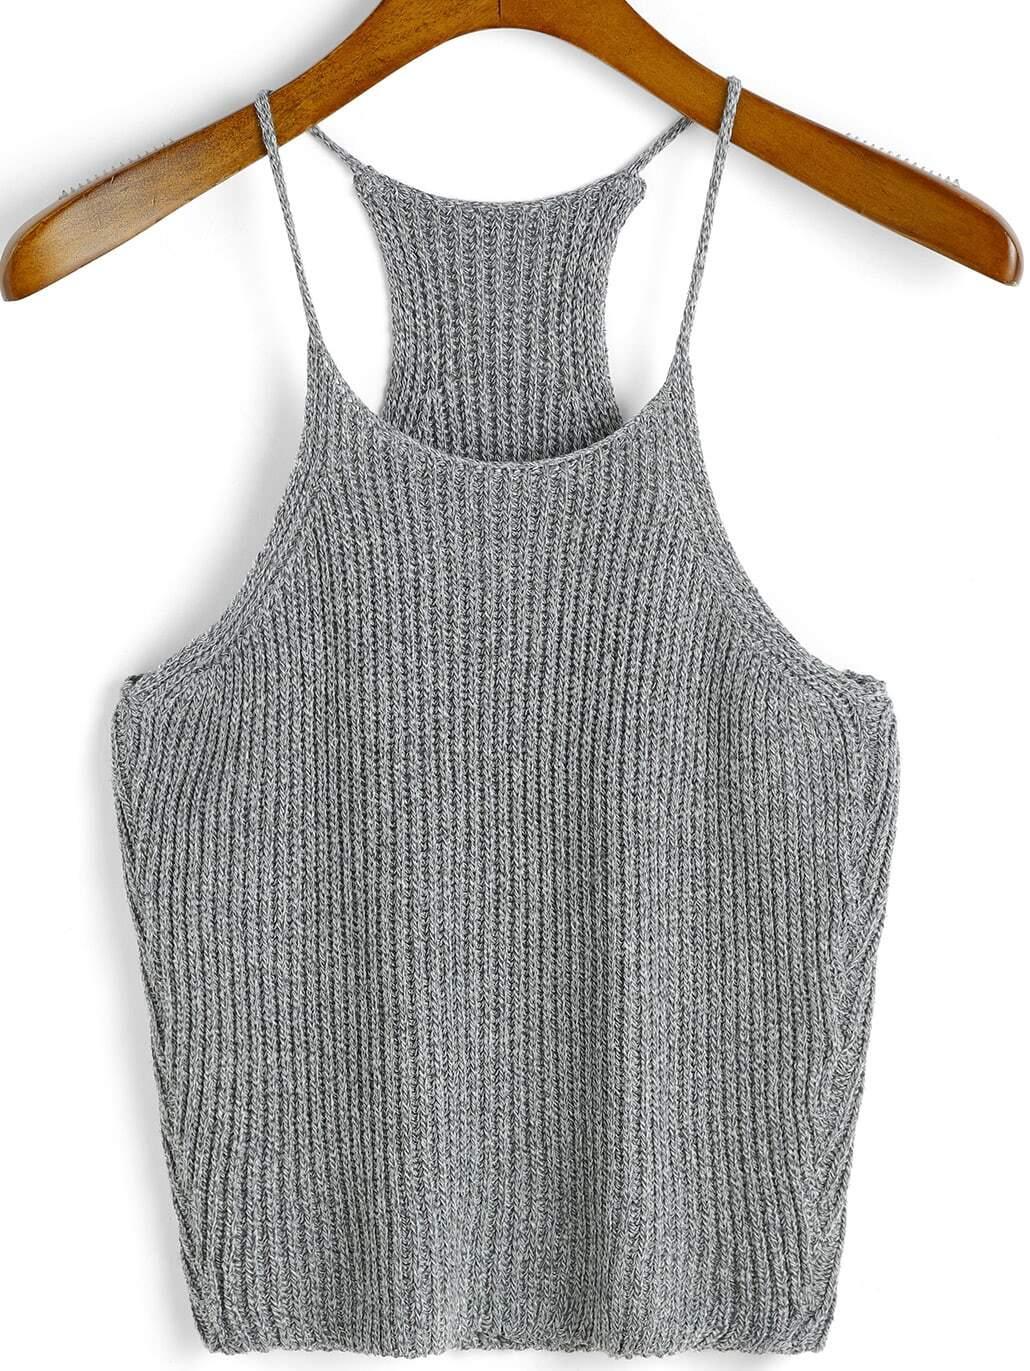 Spaghetti Strap Knit Grey Cami Top